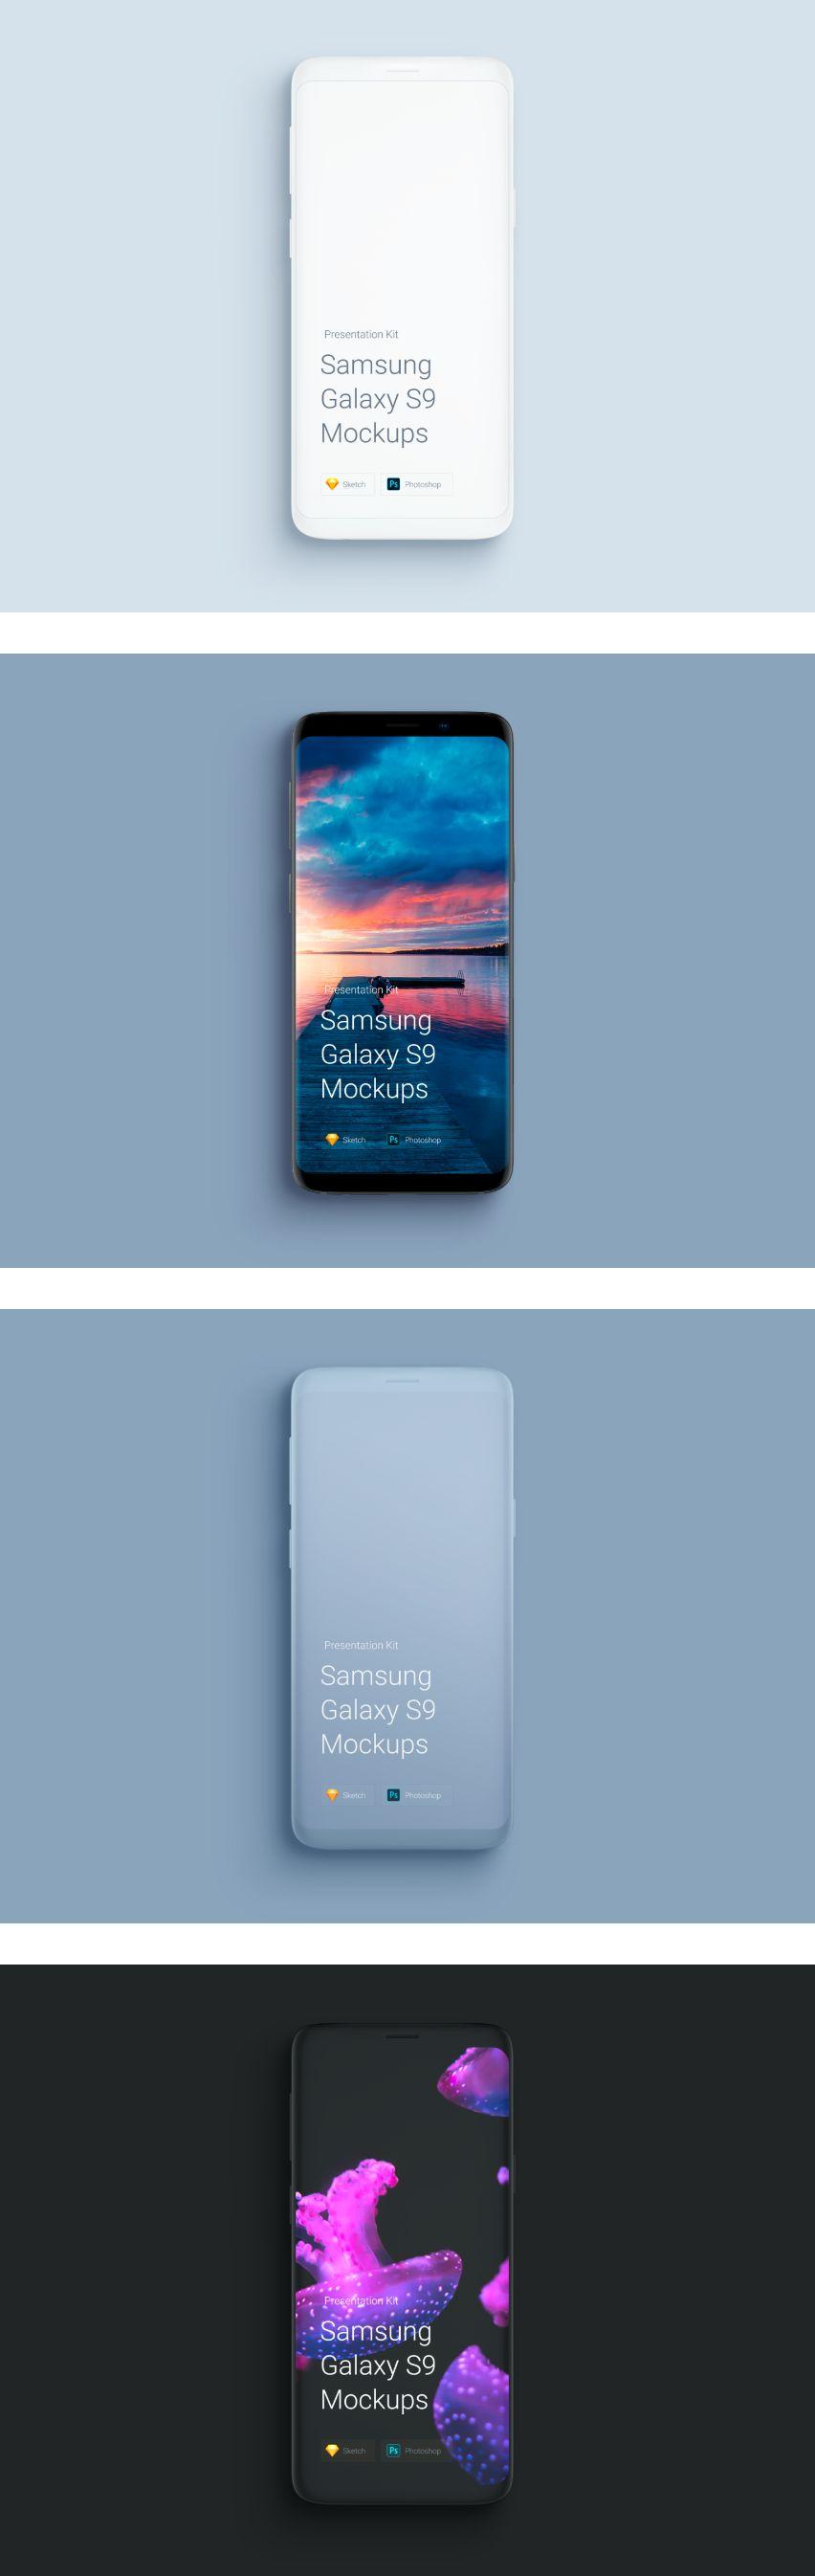 Free Samsung Galaxy S9 Mockup